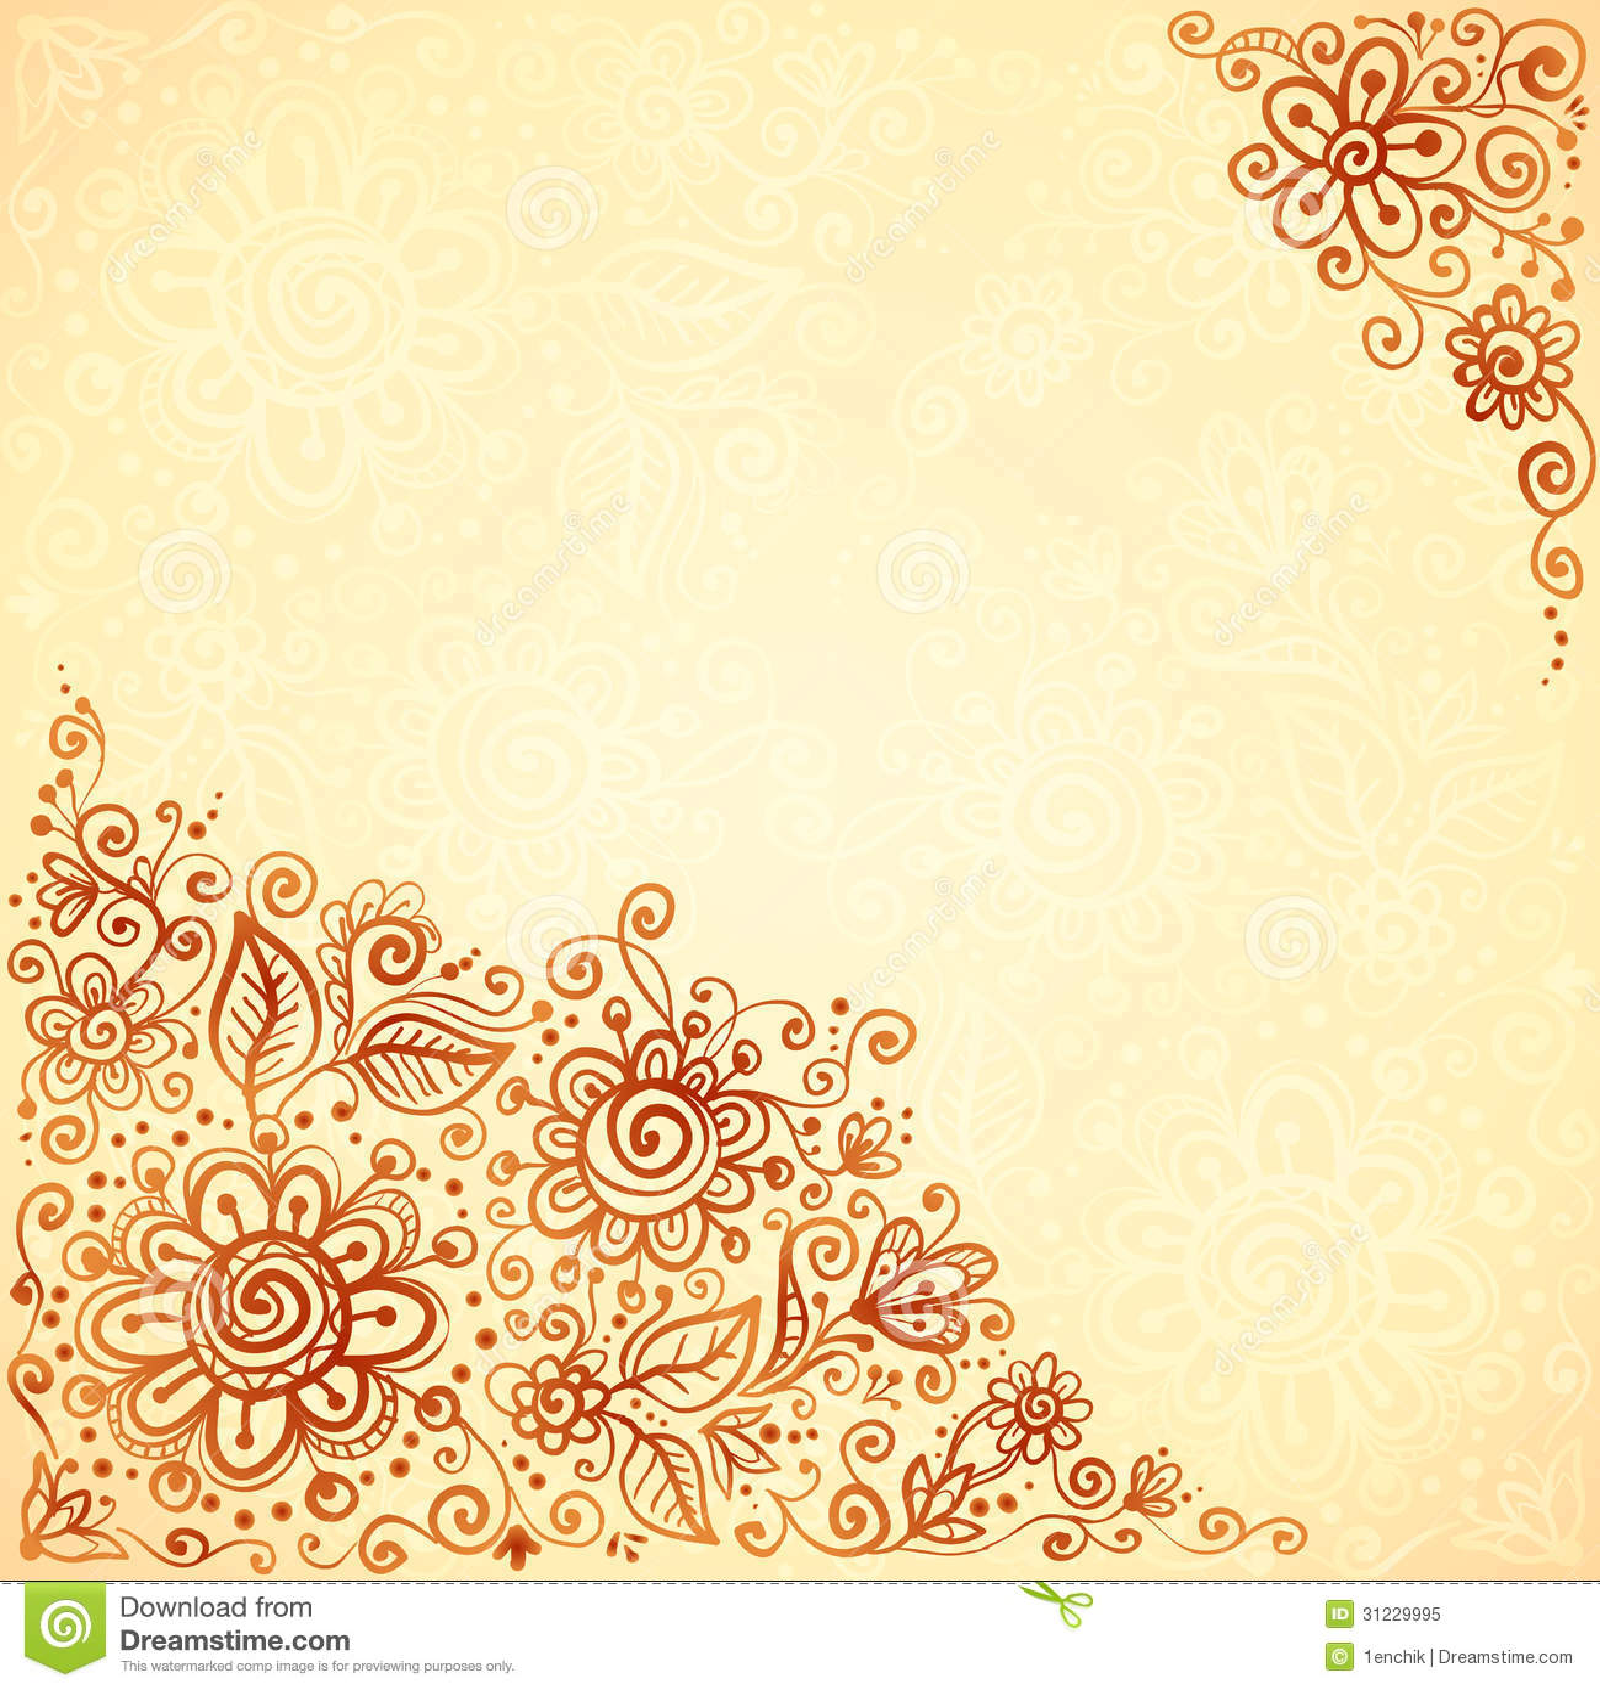 Henna Colors Flourish Artistic Background Royalty Free Stock Photo  Image 3